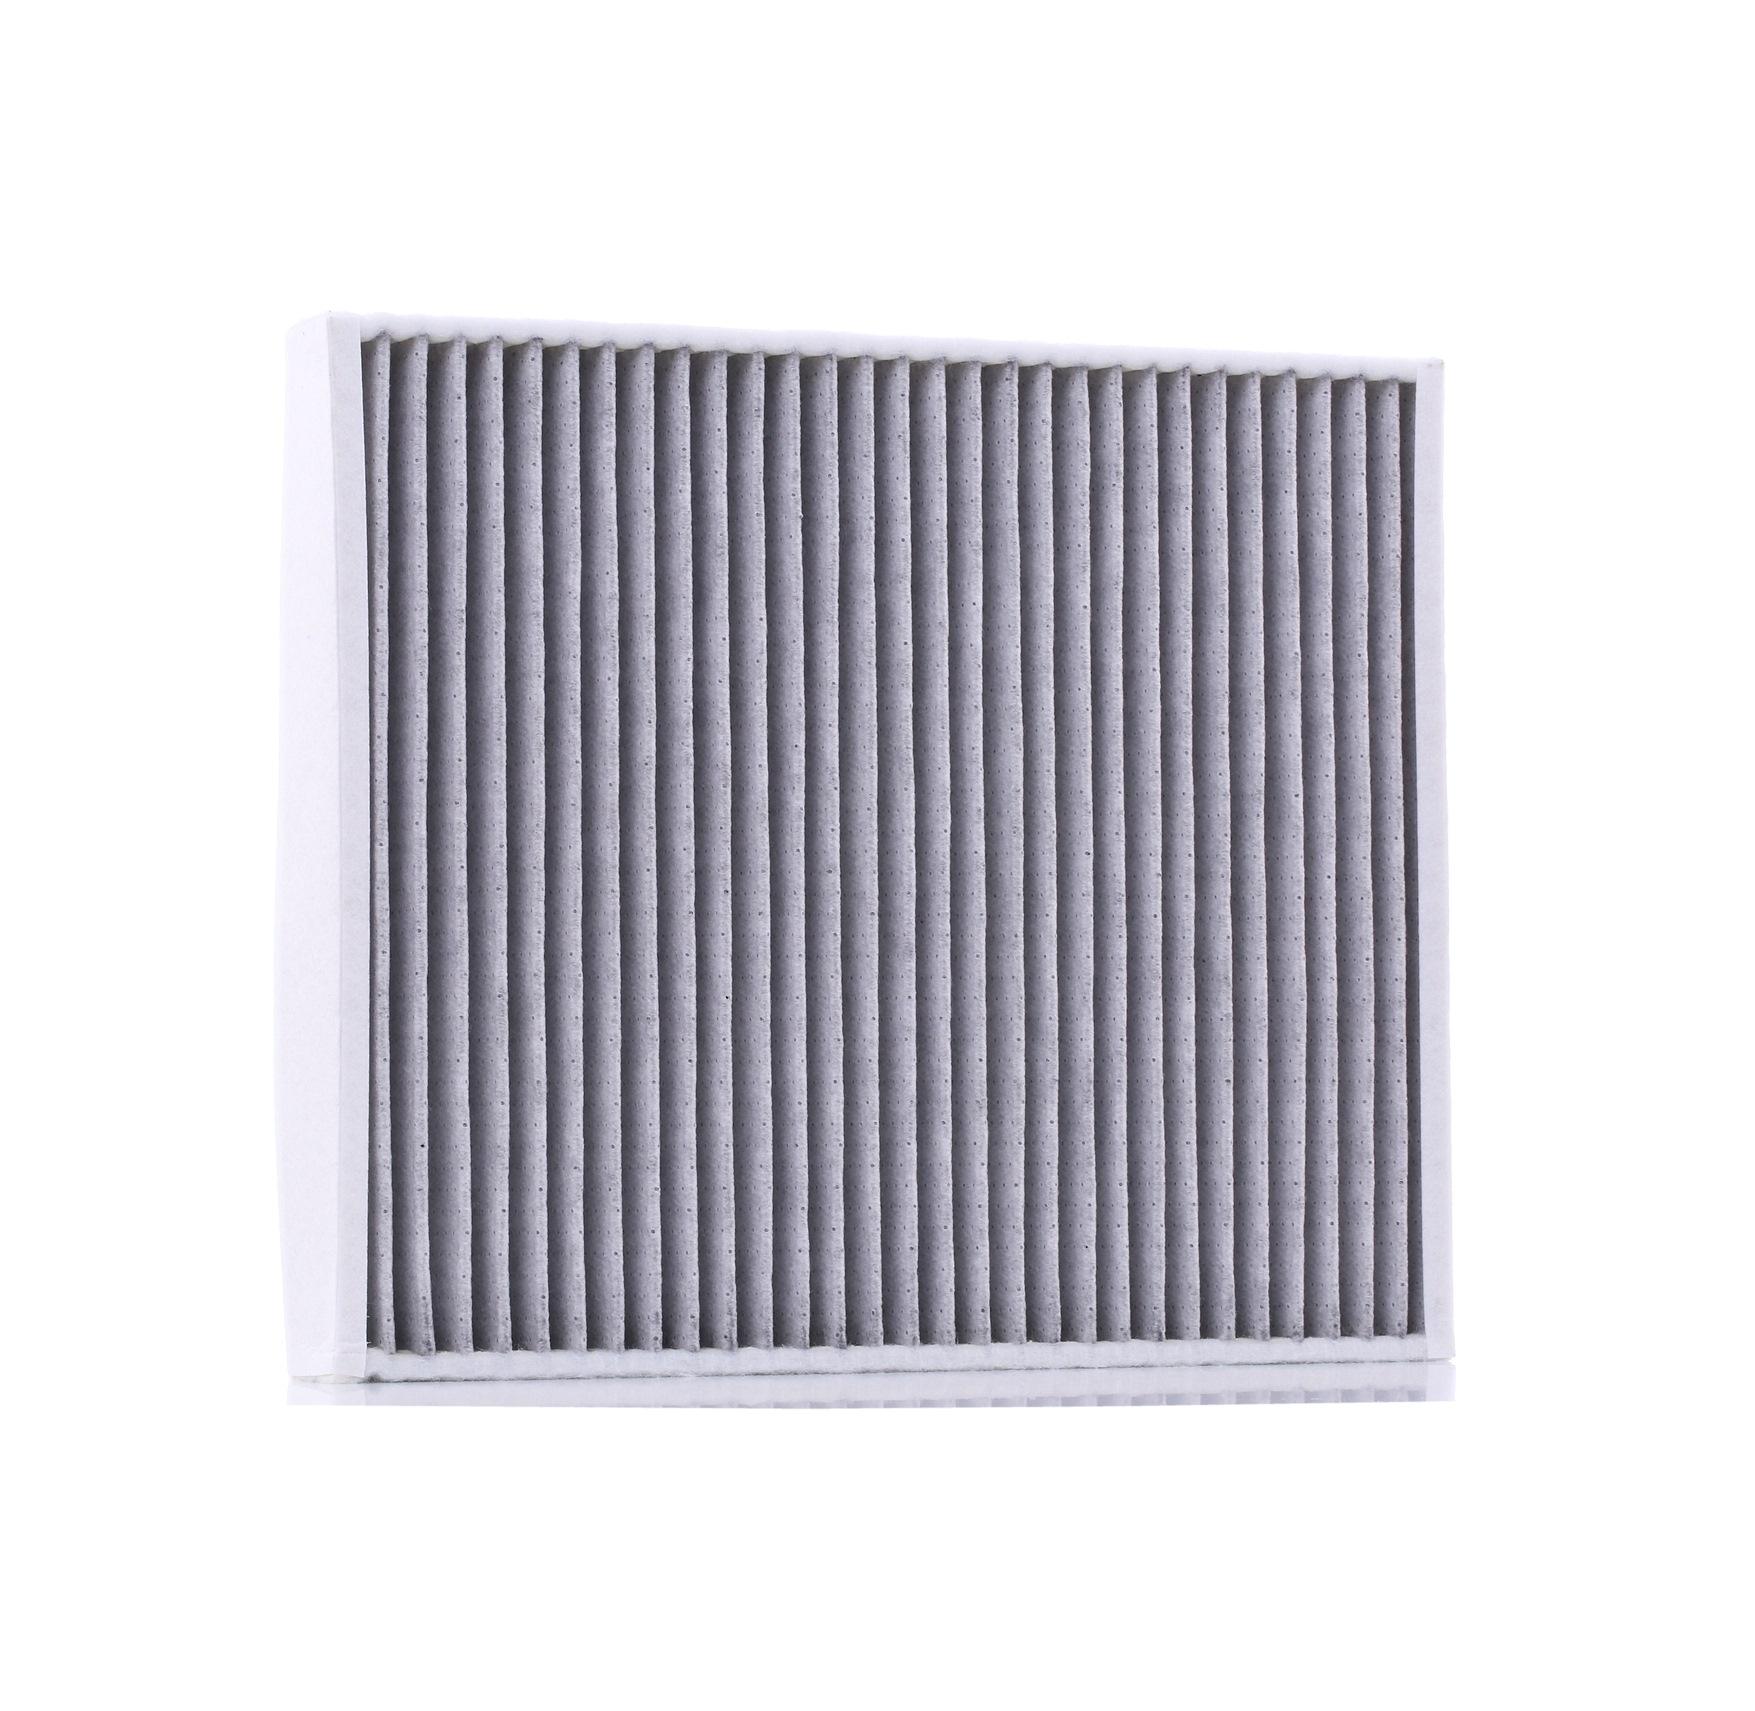 MANN-FILTER: Original Klimafilter CUK 2757 (Breite: 234mm, Höhe: 32mm, Länge: 272mm)